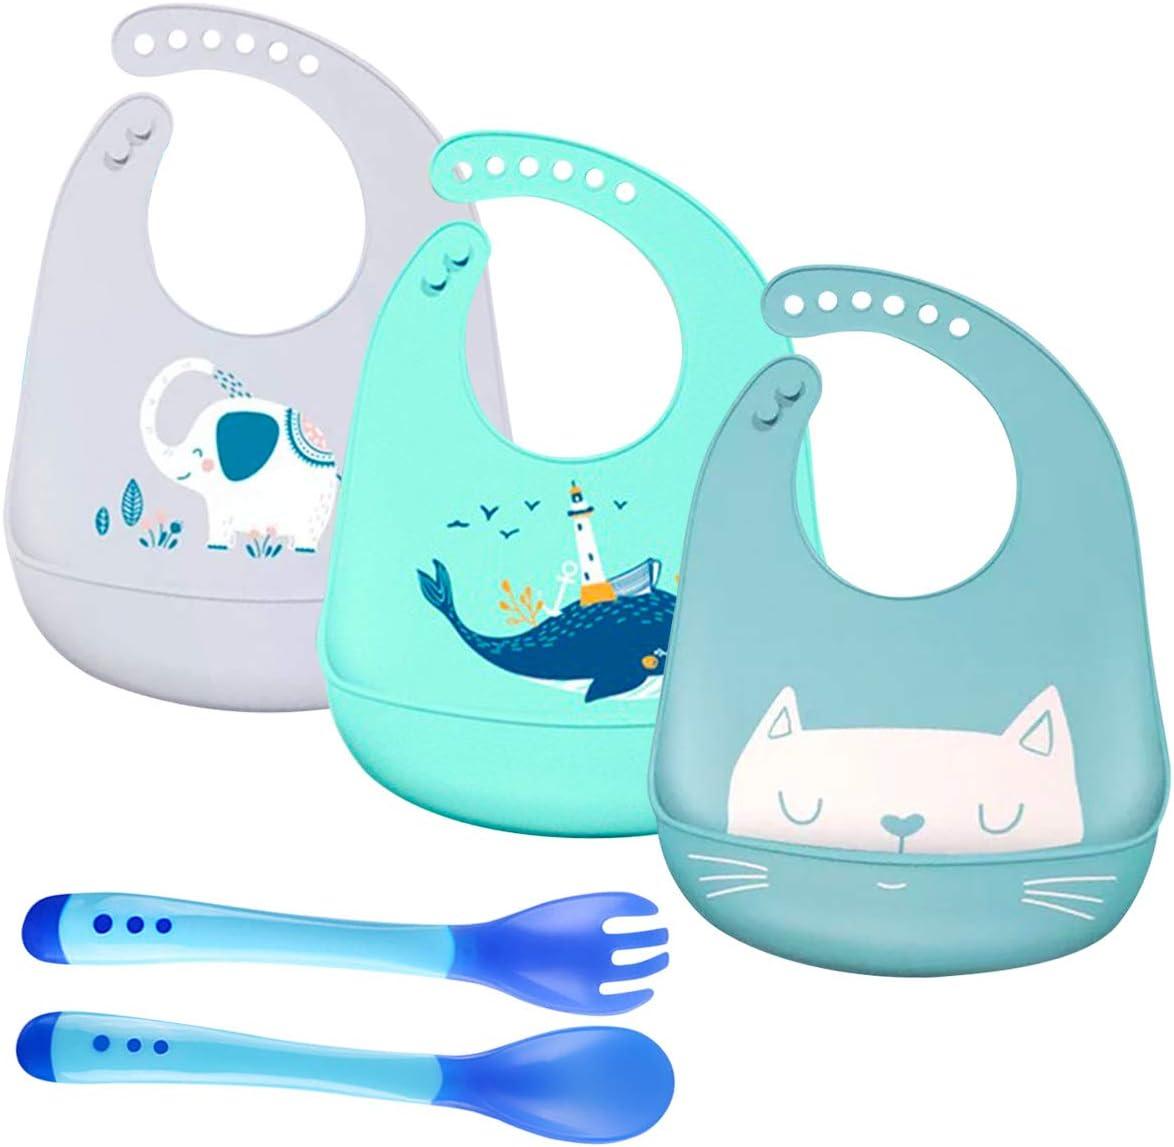 3 Piezas Baberos para Bebés Impermeables Baberos de Silicona para Recolector Migas de Alimentos